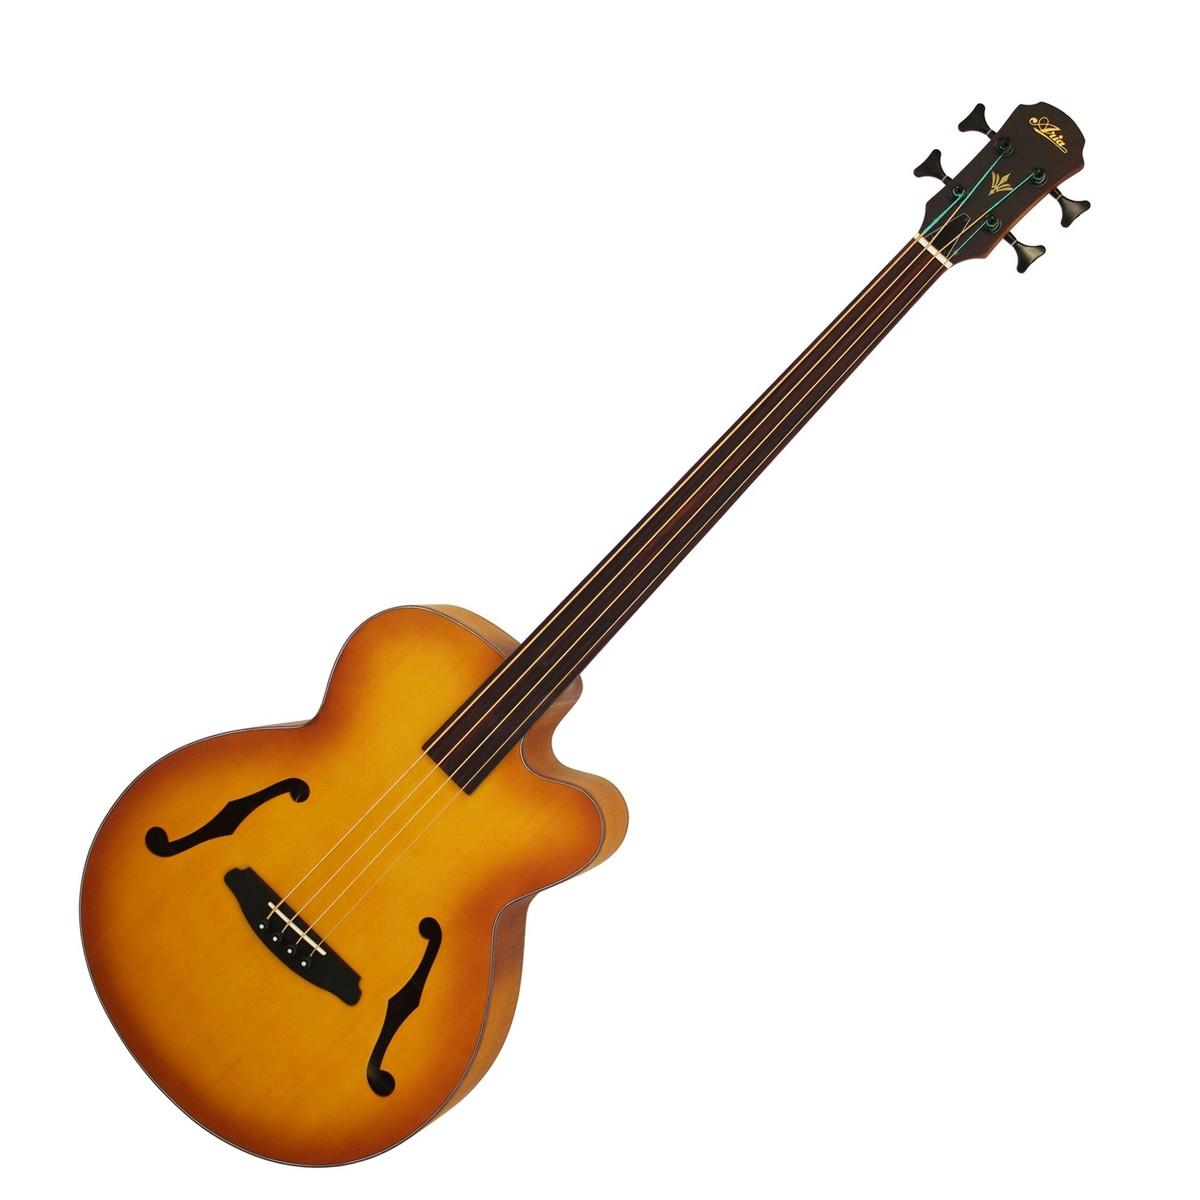 aria feb fretless electro acoustic bass guitar light vintage burst b stock at gear4music. Black Bedroom Furniture Sets. Home Design Ideas